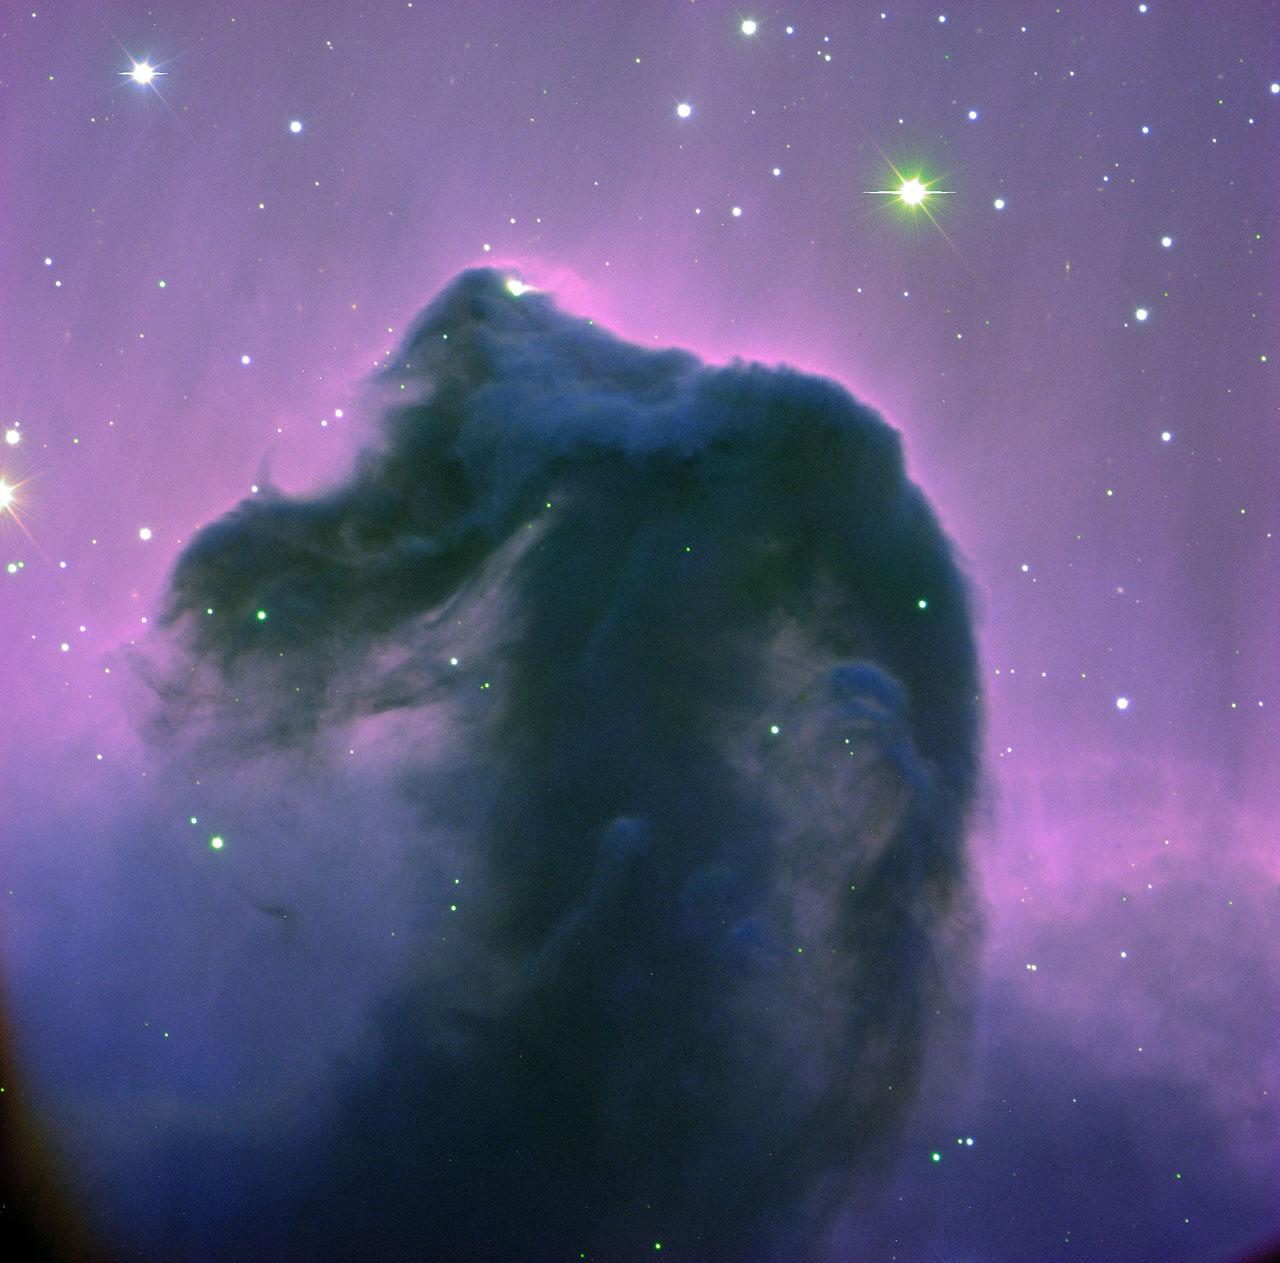 Horsehead Nebula Ic 434 Esa Hubble